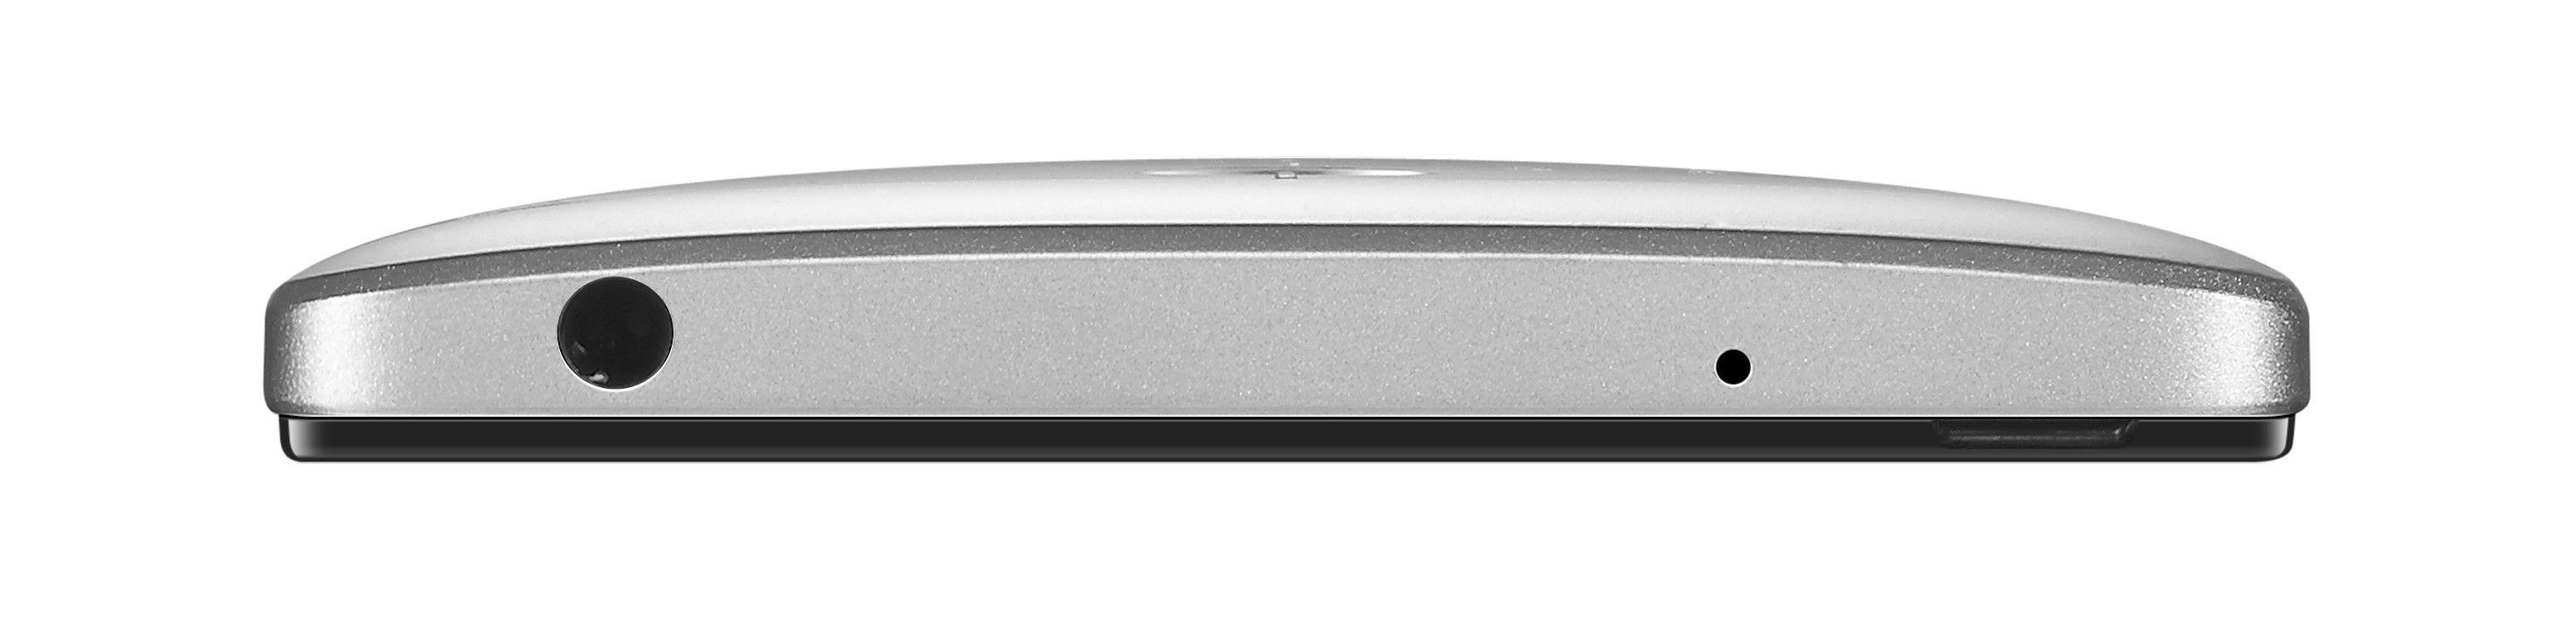 Мобильный телефон Lenovo VIBE P1 Pro Silver - 2